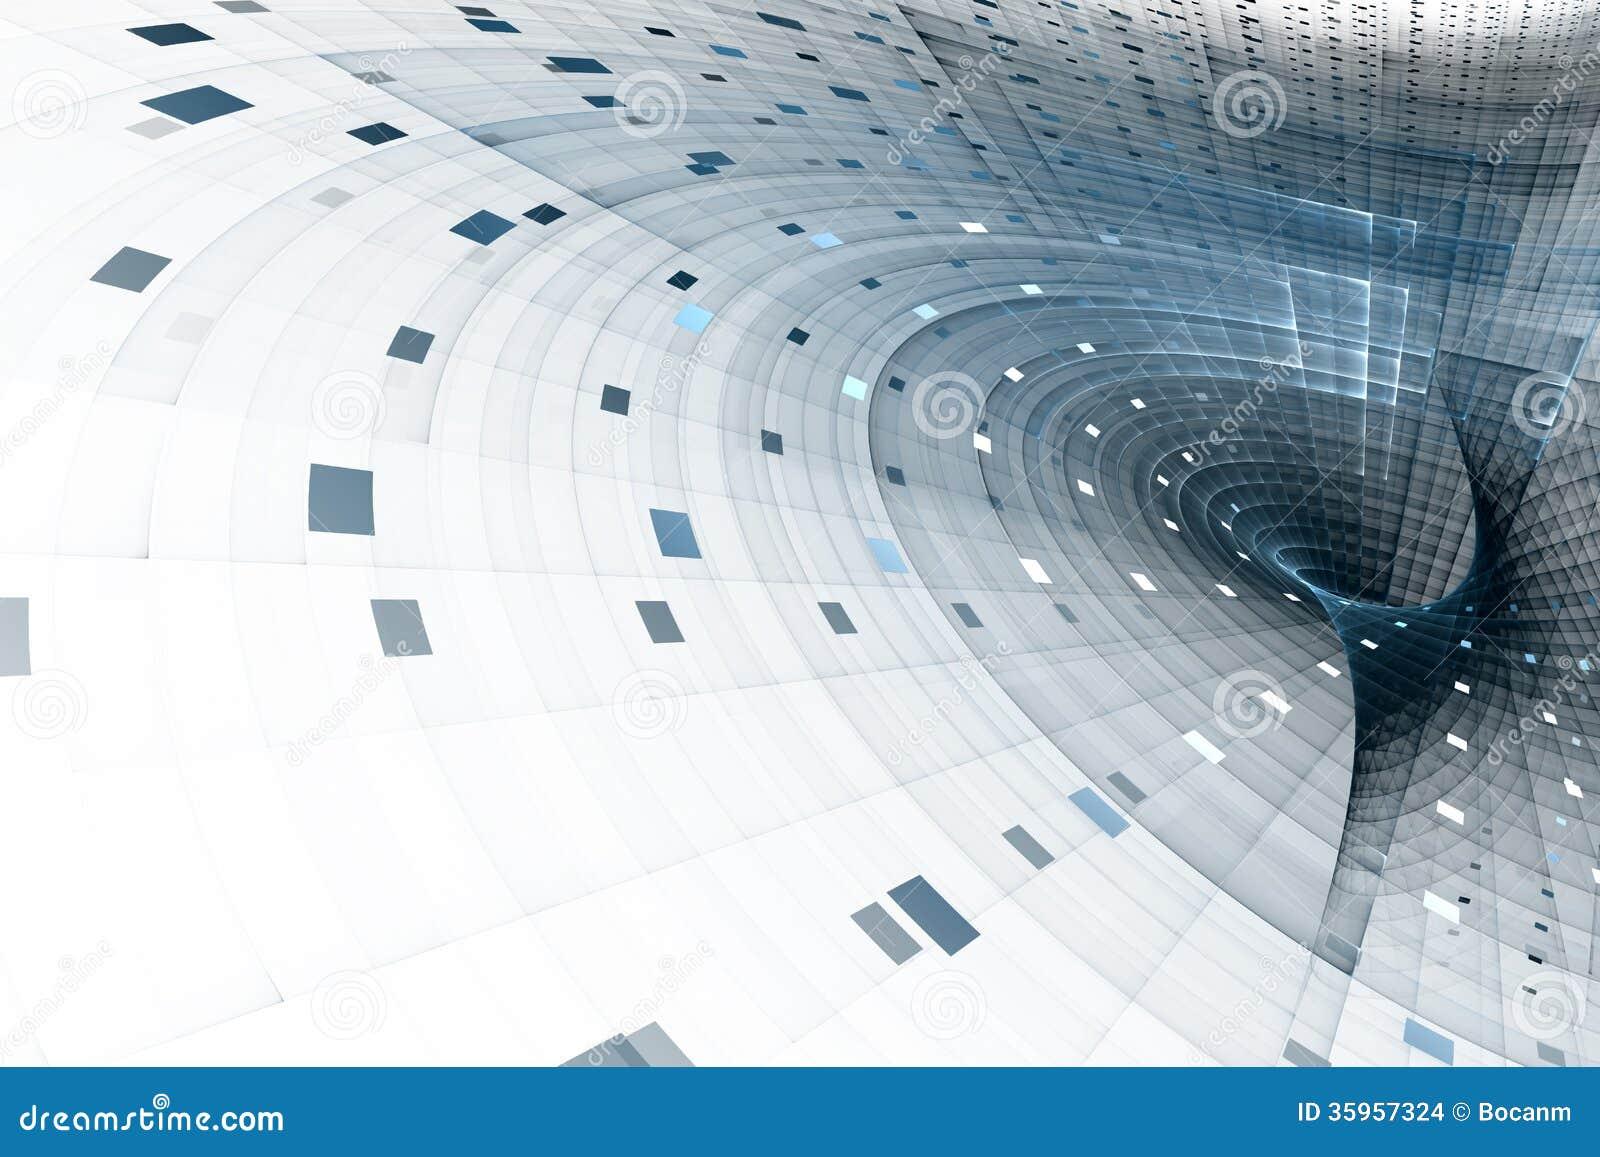 Science technology company